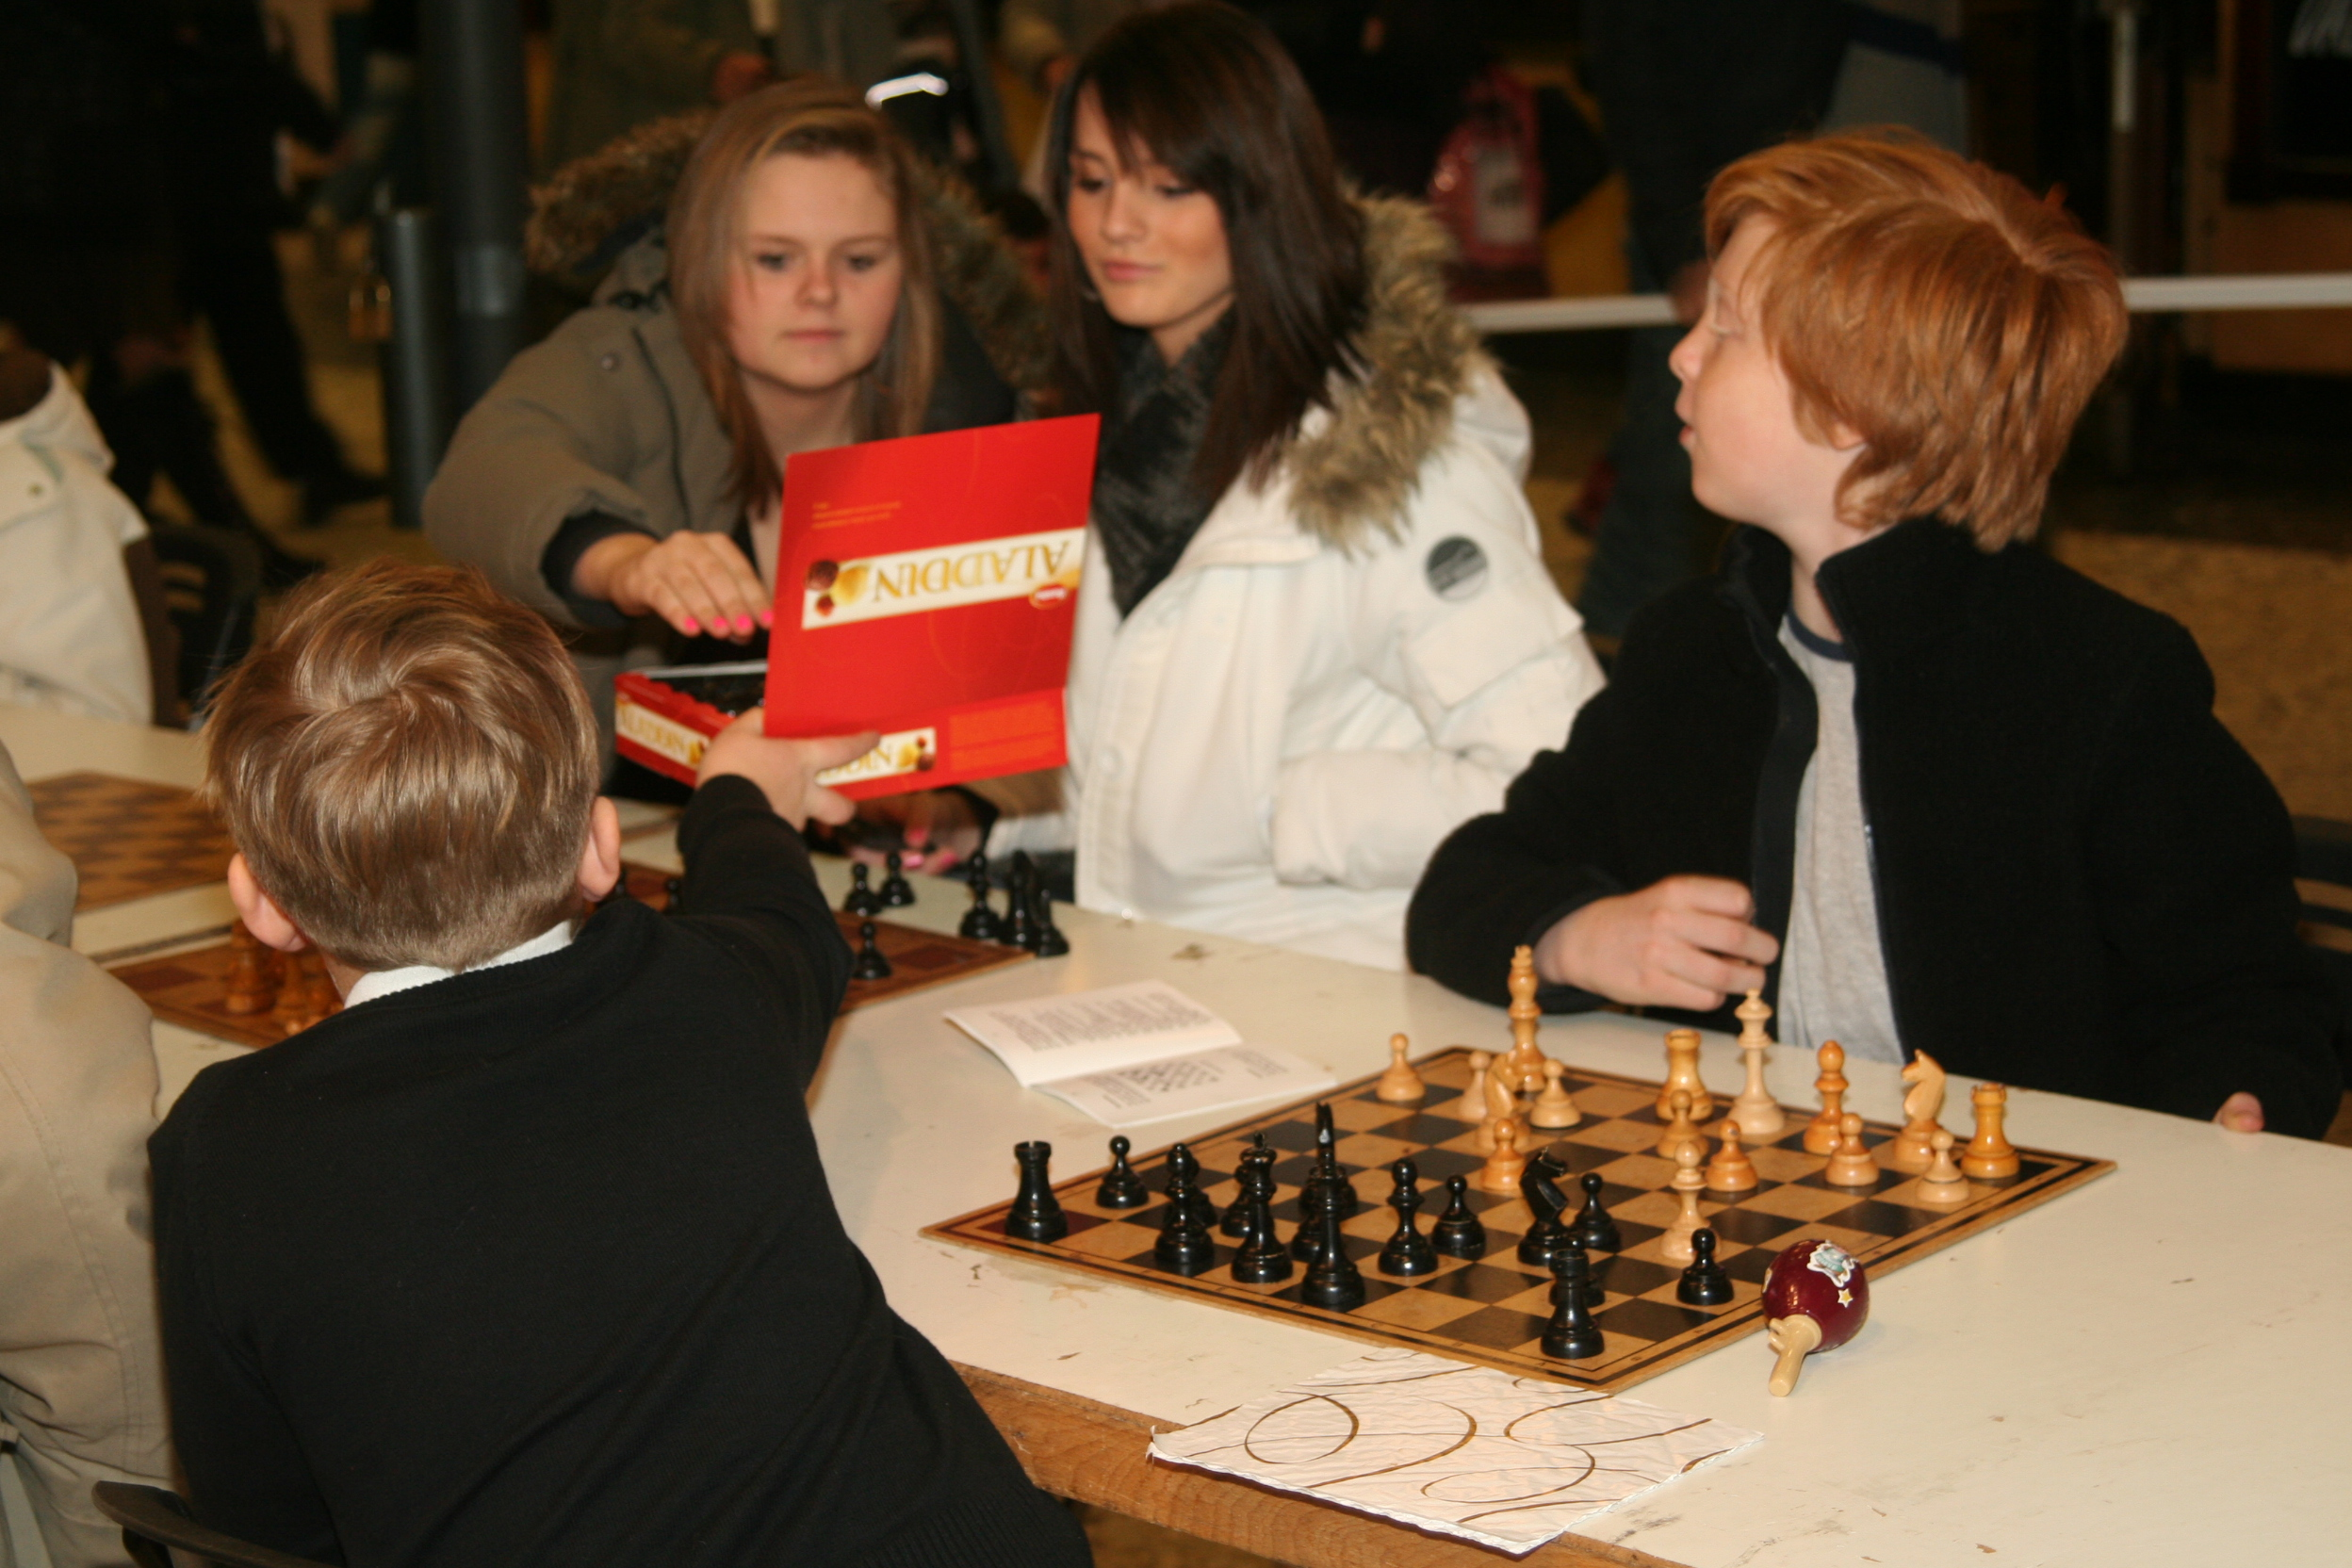 Gentlemannen Gösta Larsson bjöd damer i publiken på priskonfekt.